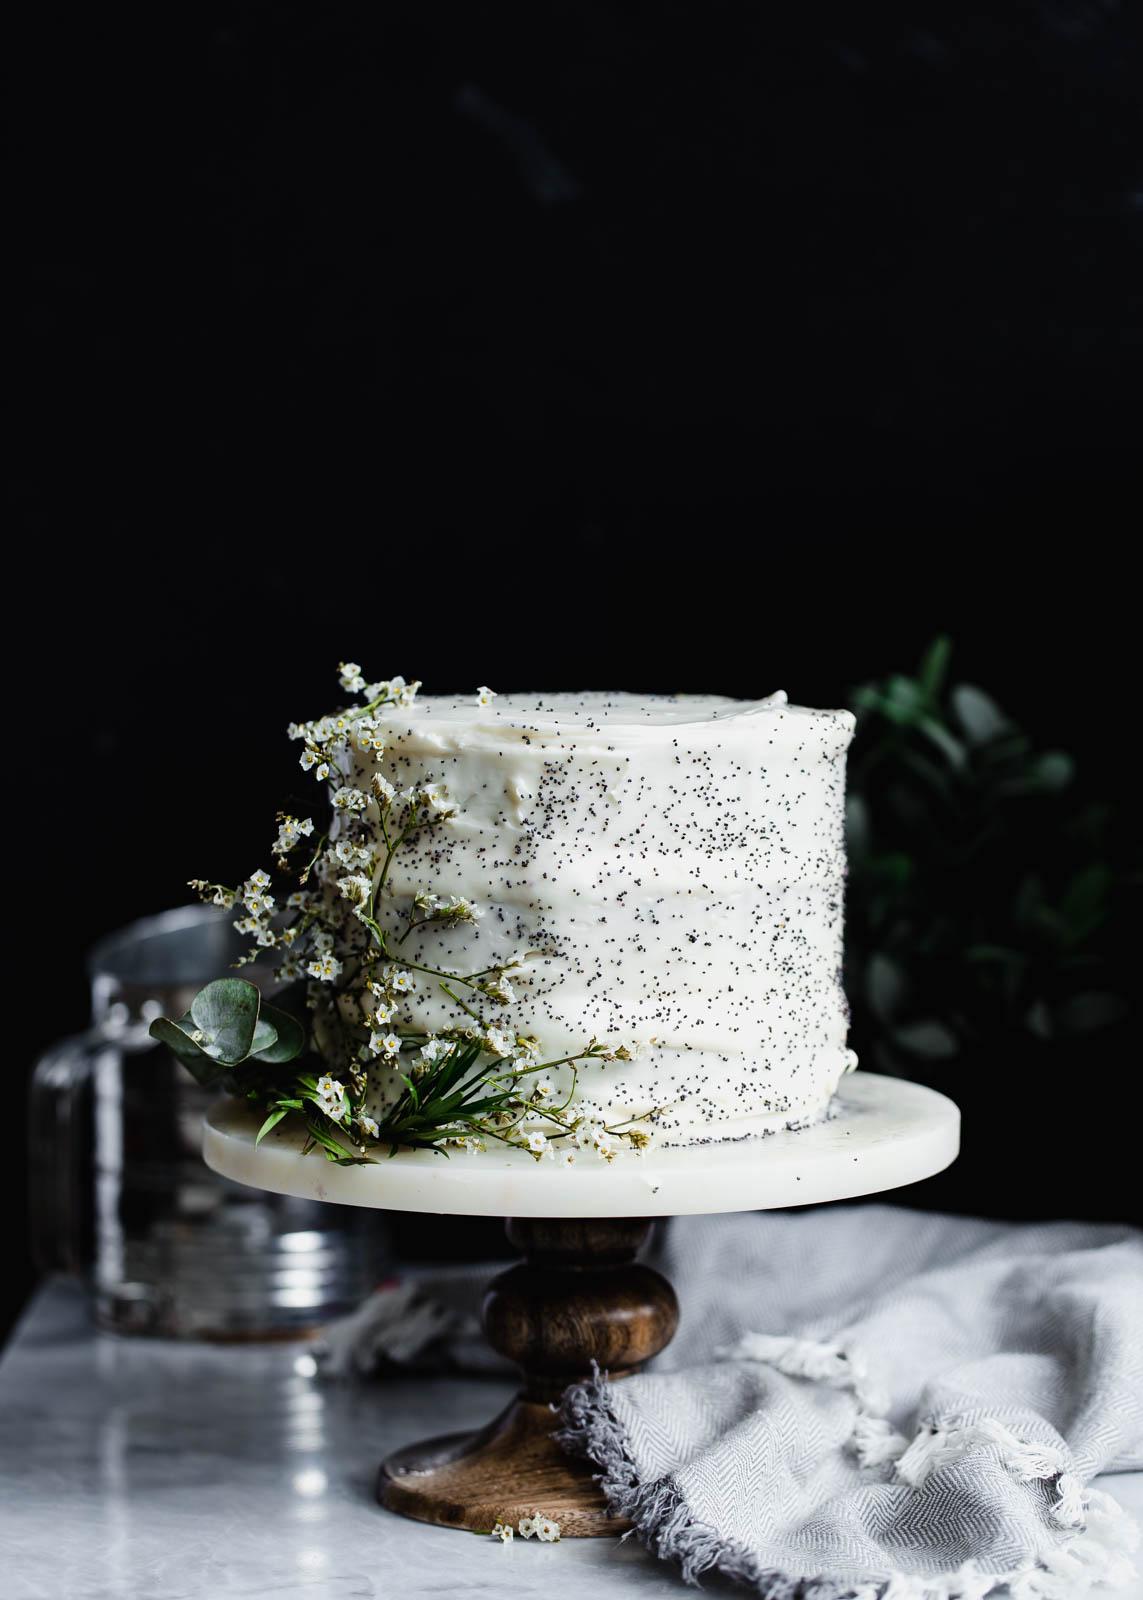 lemon poppy seed cake with flowers